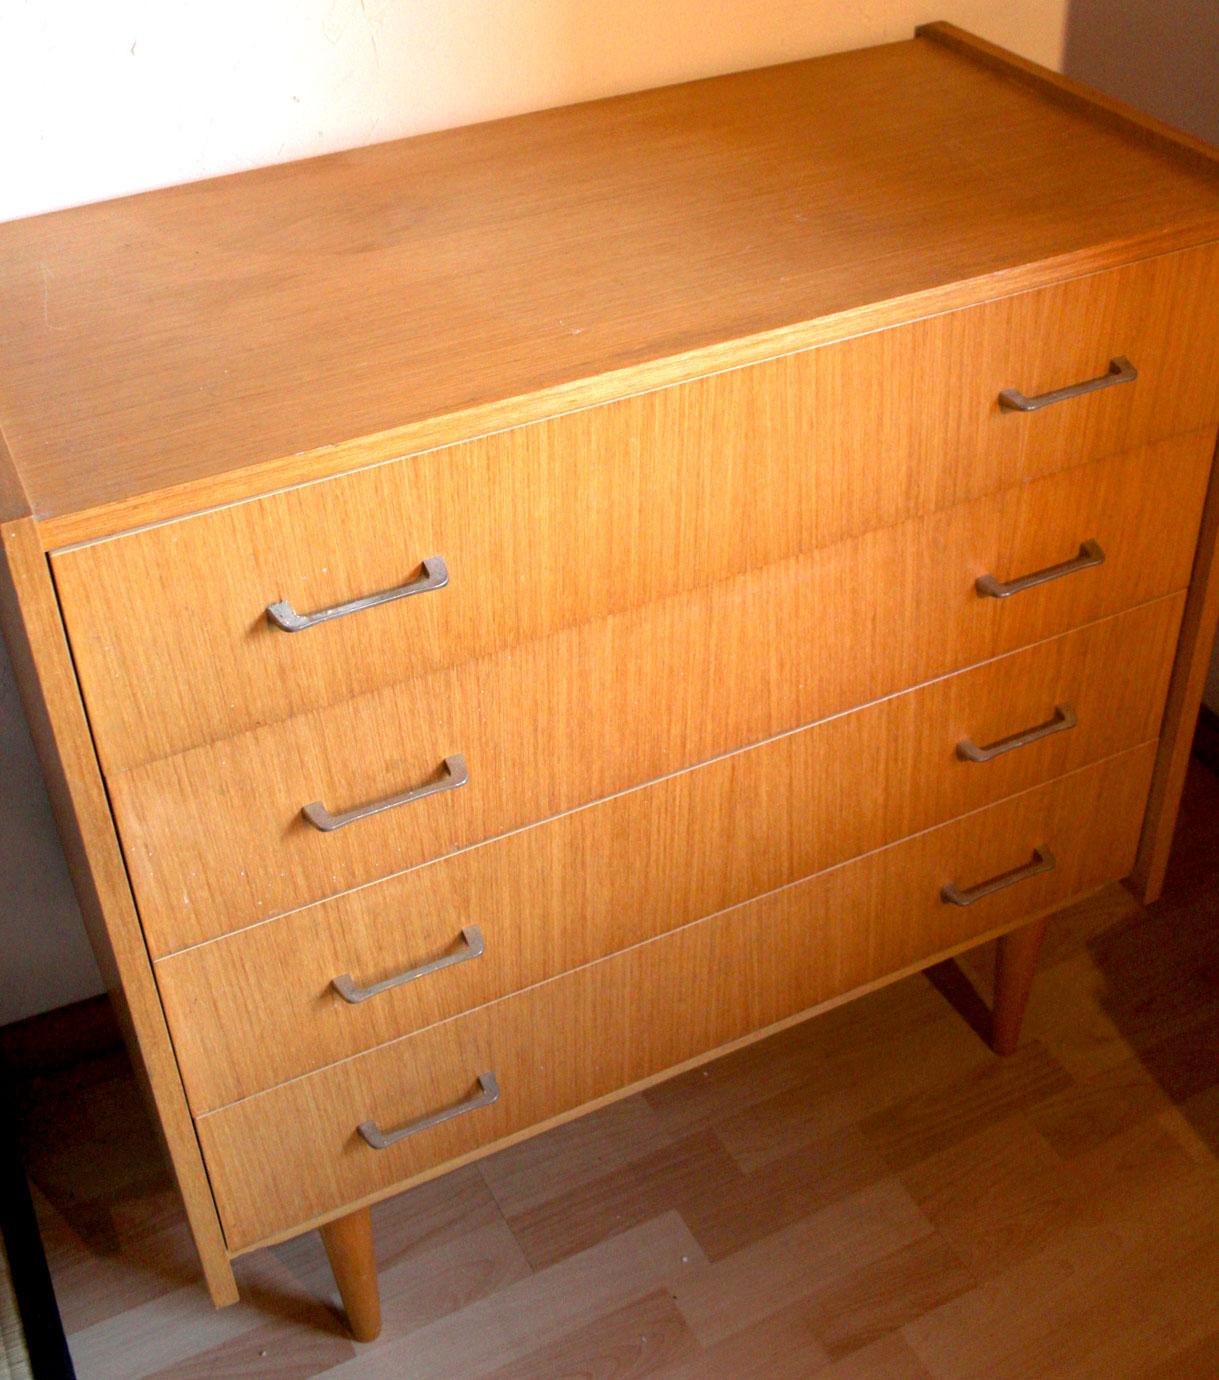 chicbaazar objets vintage 50 60 70 commode ann e 50 60 pi tement fusel. Black Bedroom Furniture Sets. Home Design Ideas